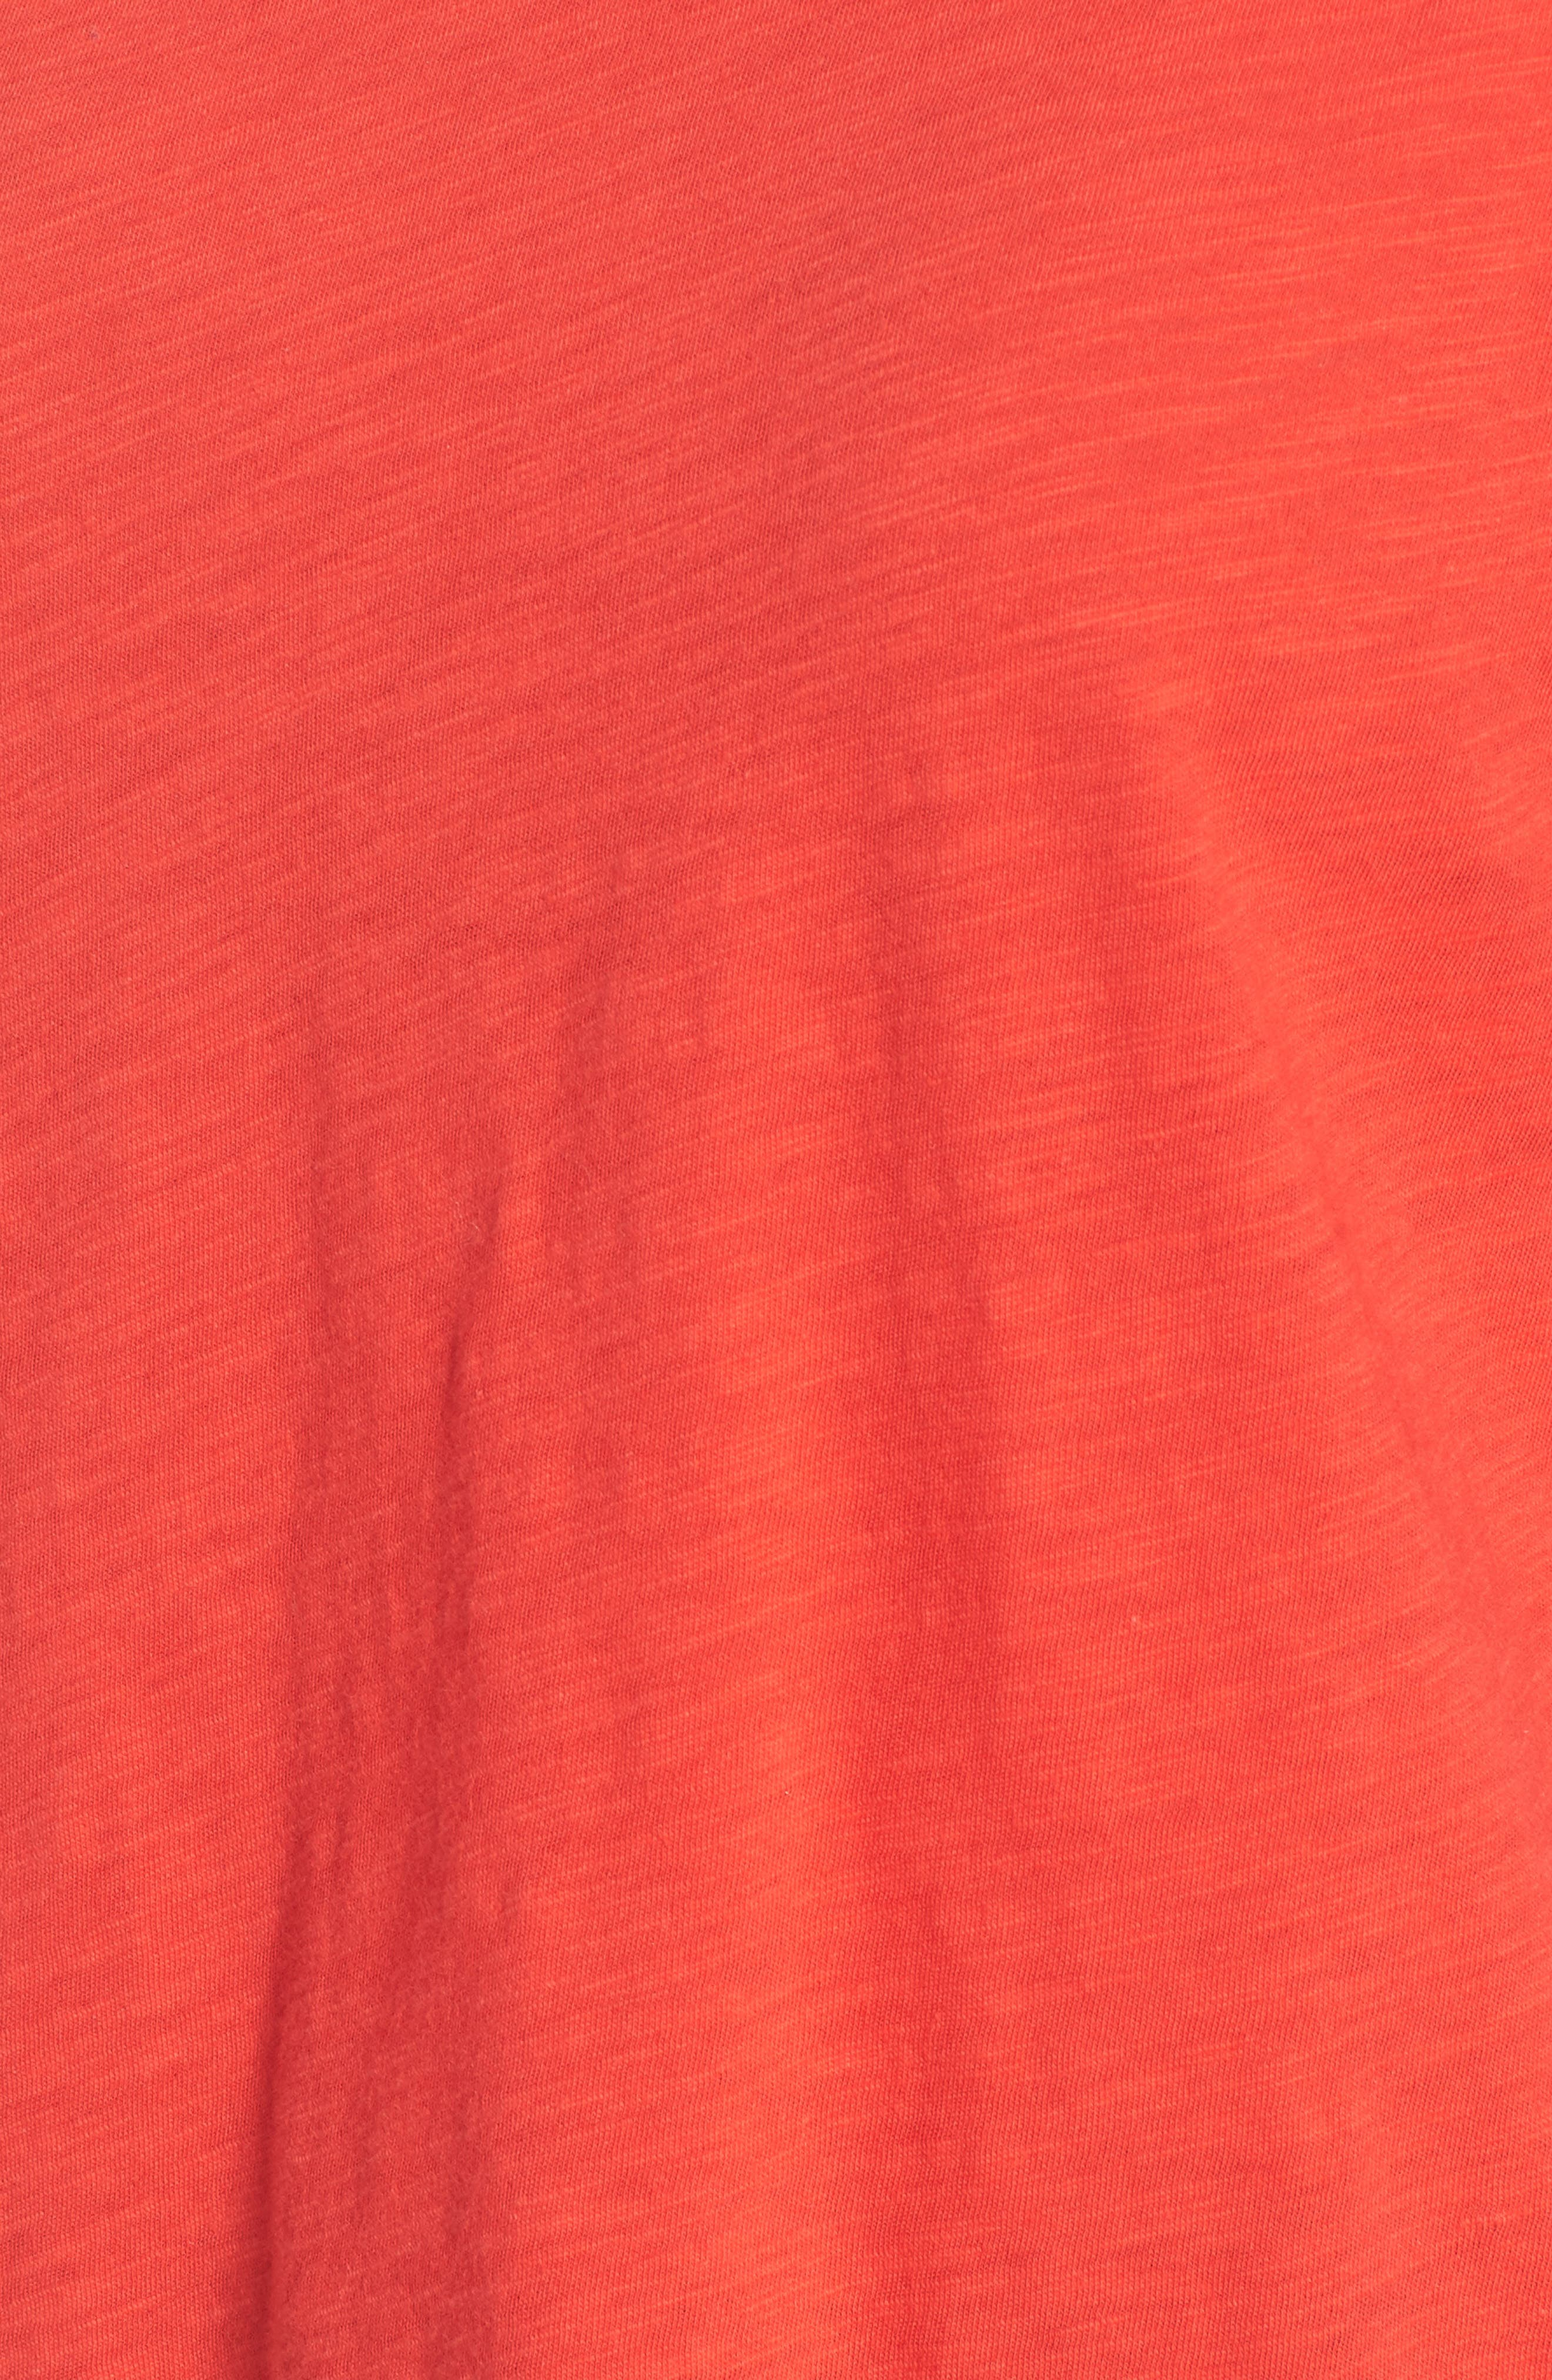 Eyelet Sleeve Burnout Tee,                             Alternate thumbnail 6, color,                             Red